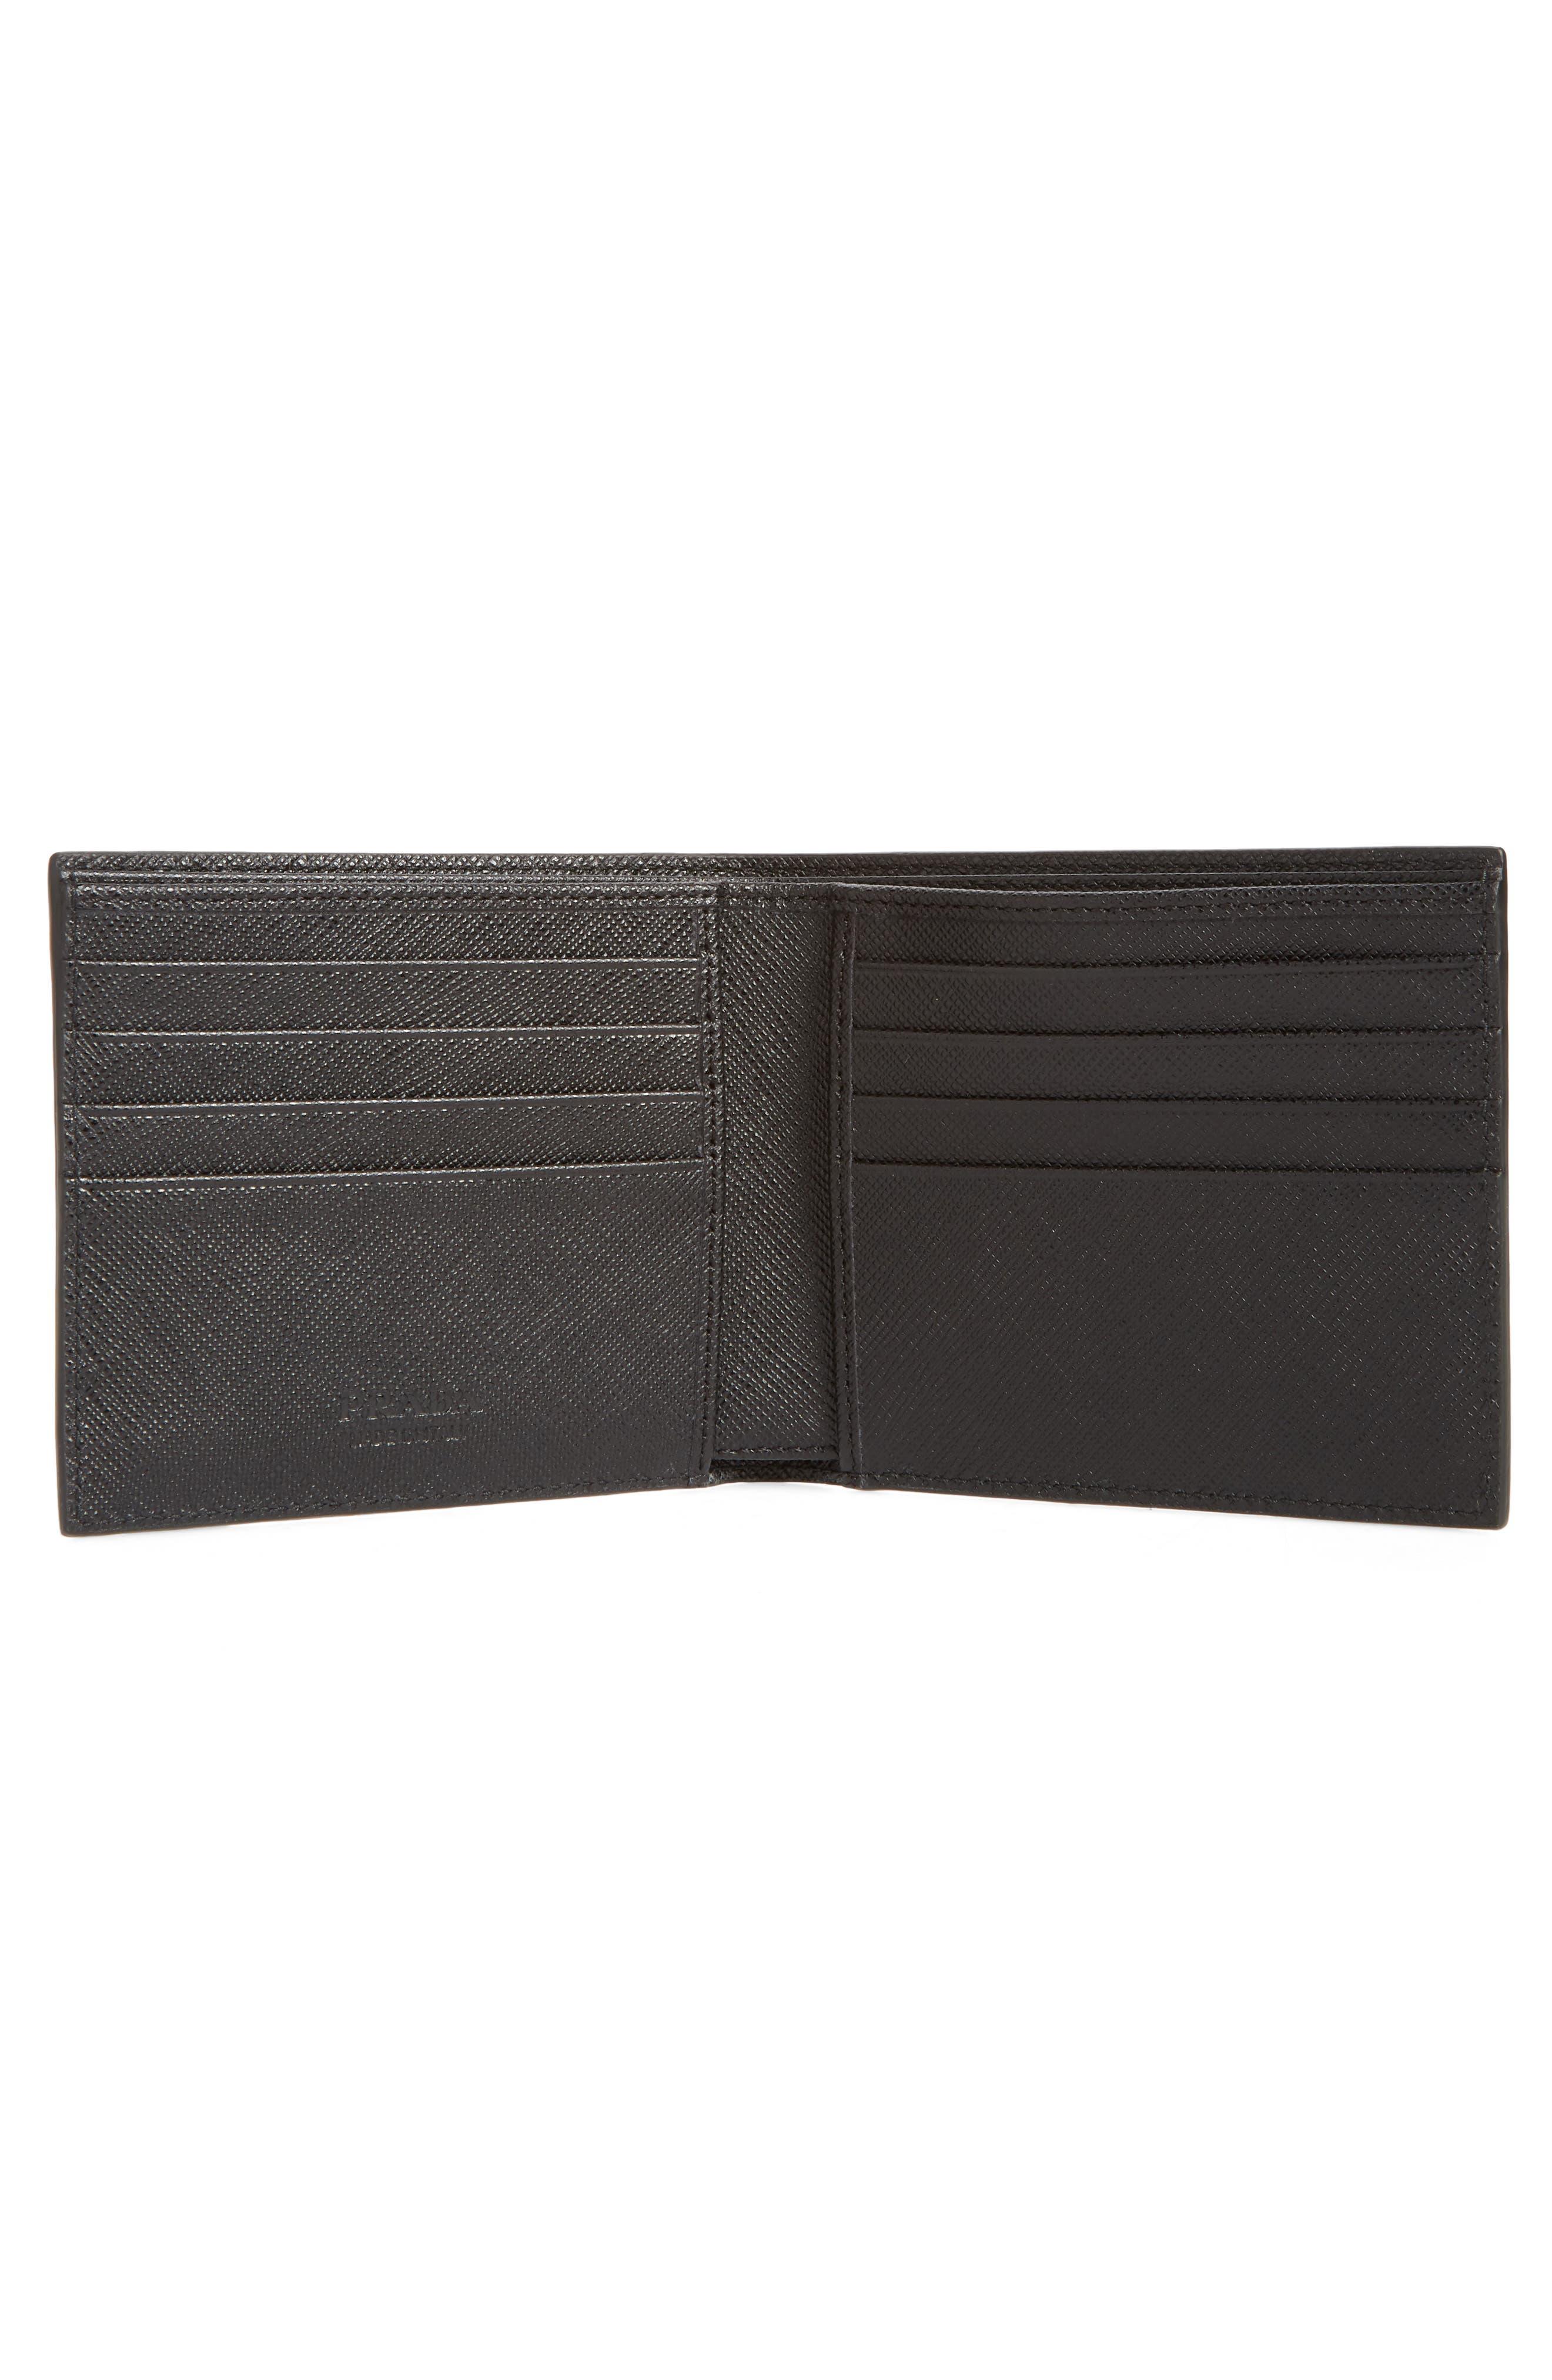 Arrow Calfskin Leather Wallet,                             Alternate thumbnail 2, color,                             911